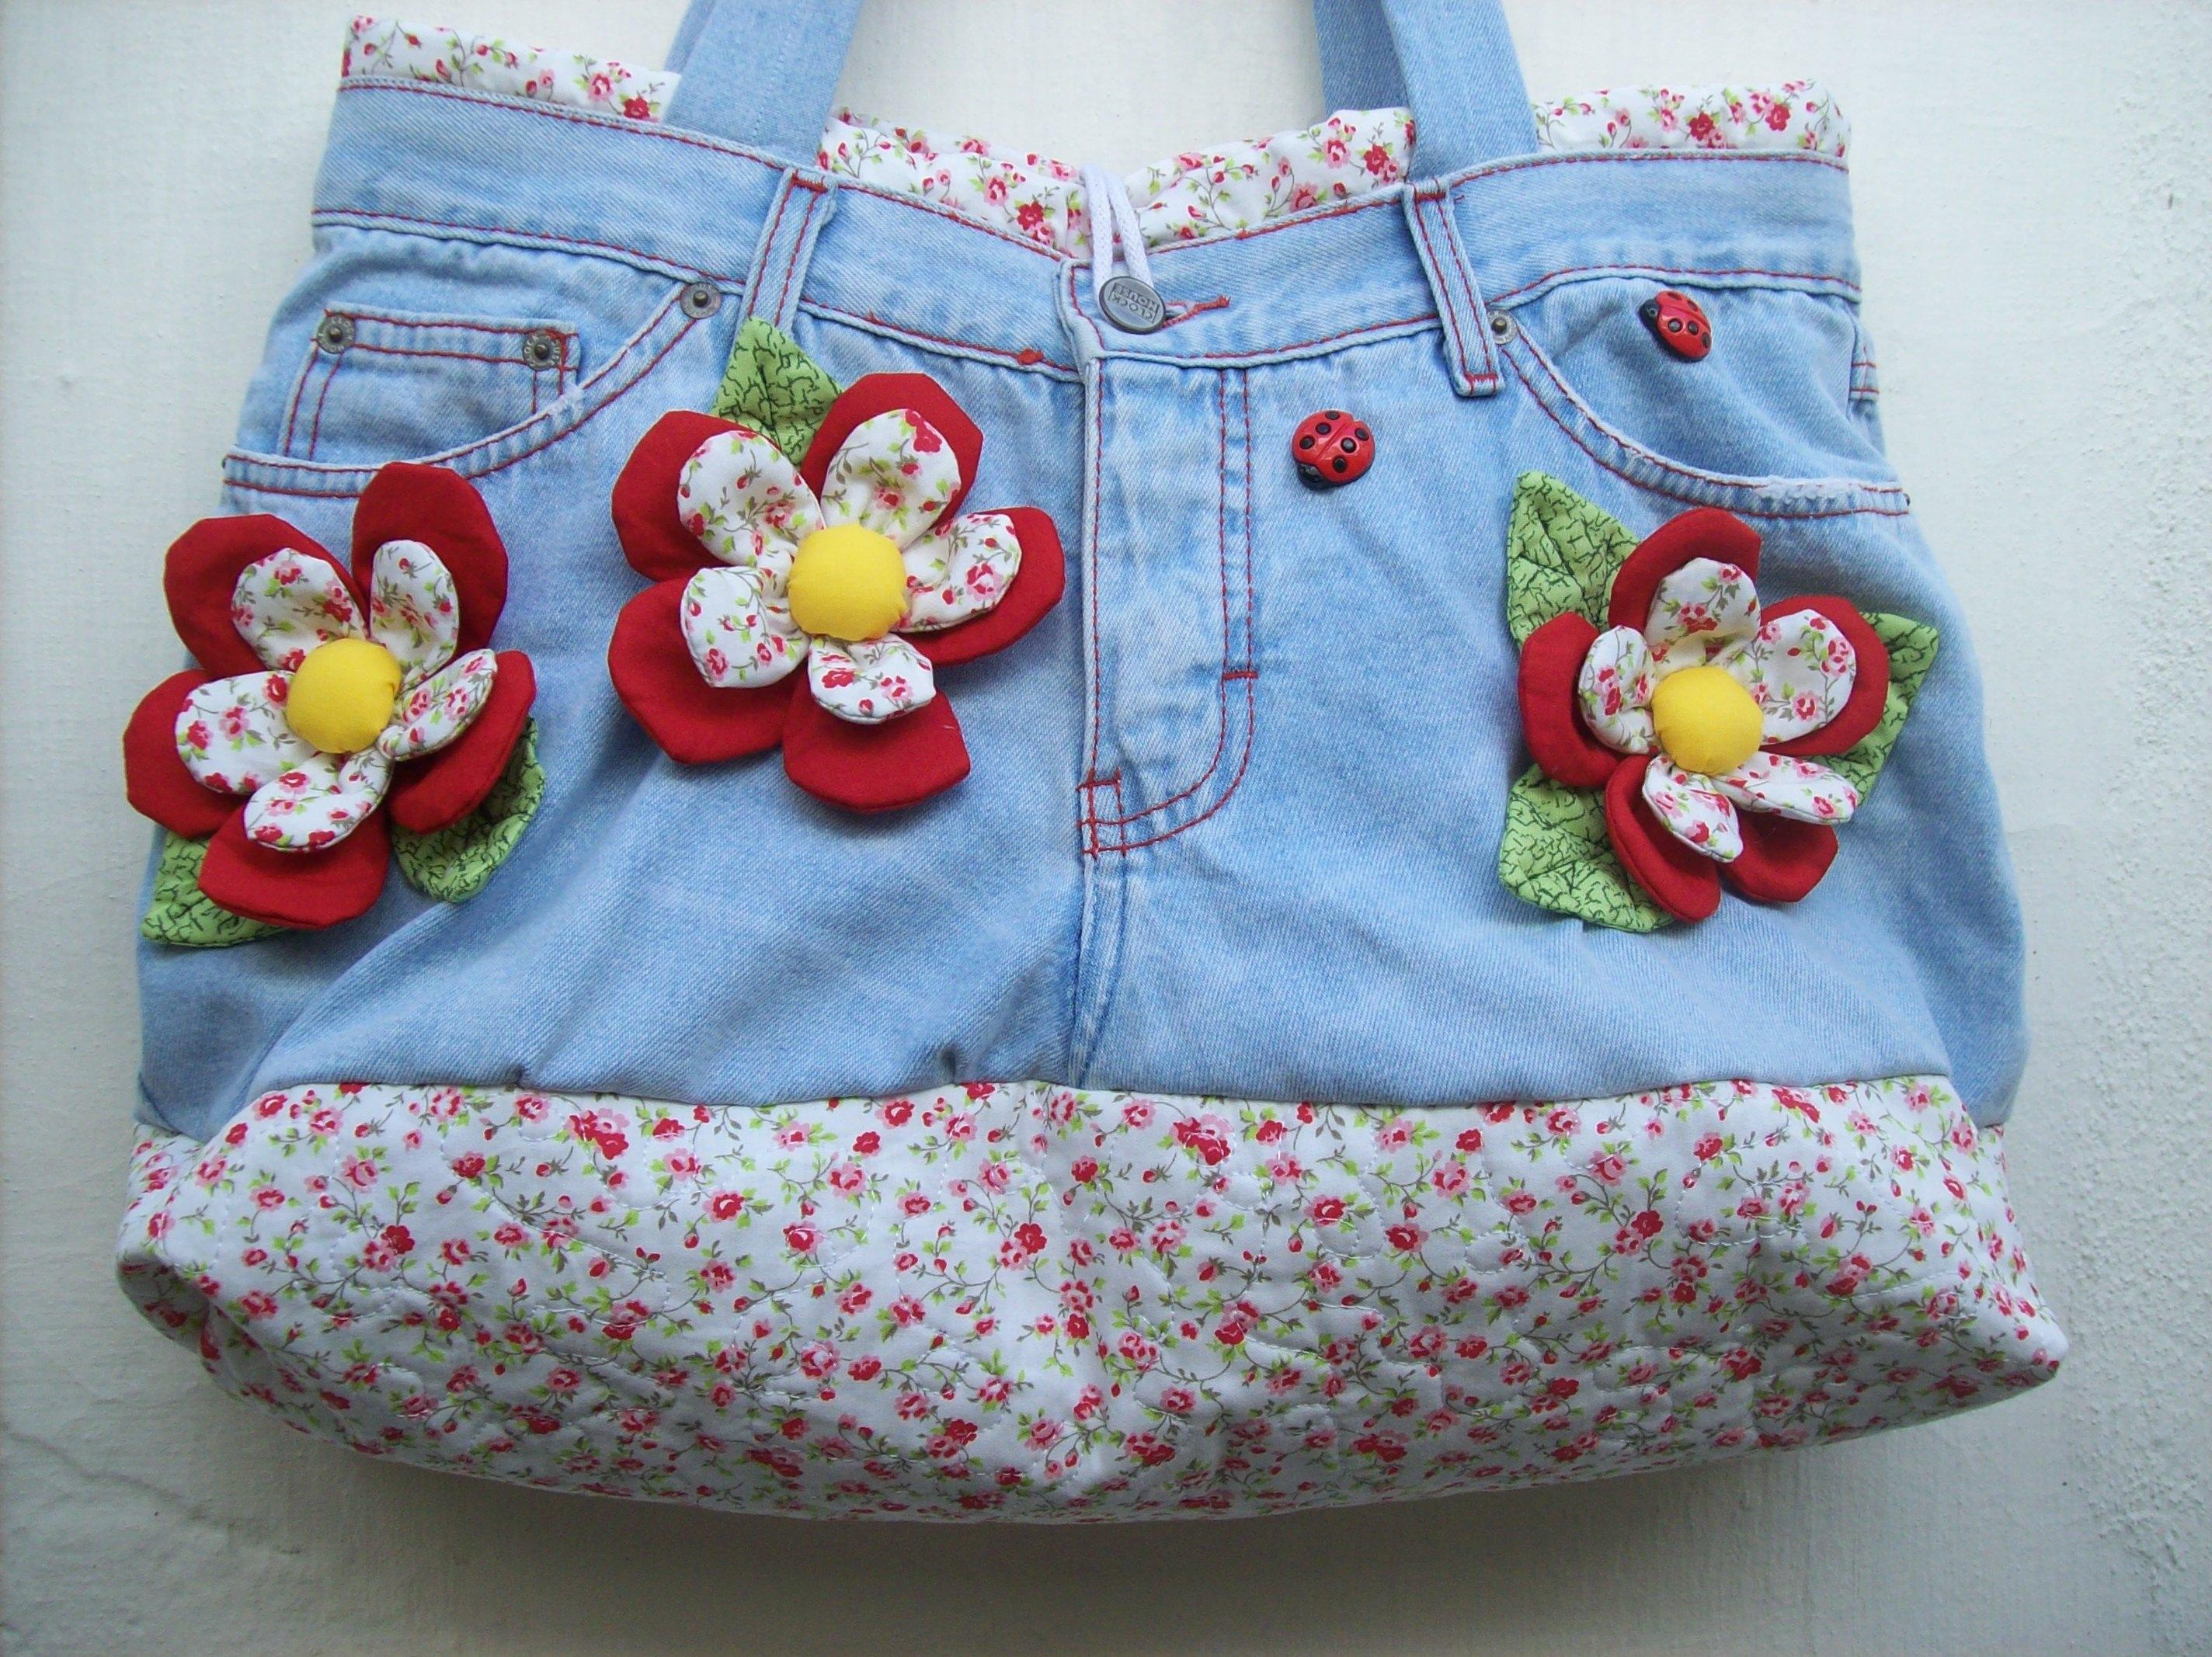 Bolsa De Tecido Jeans Passo A Passo : Bolsa jeans quot flowers dianne pedrosa elo